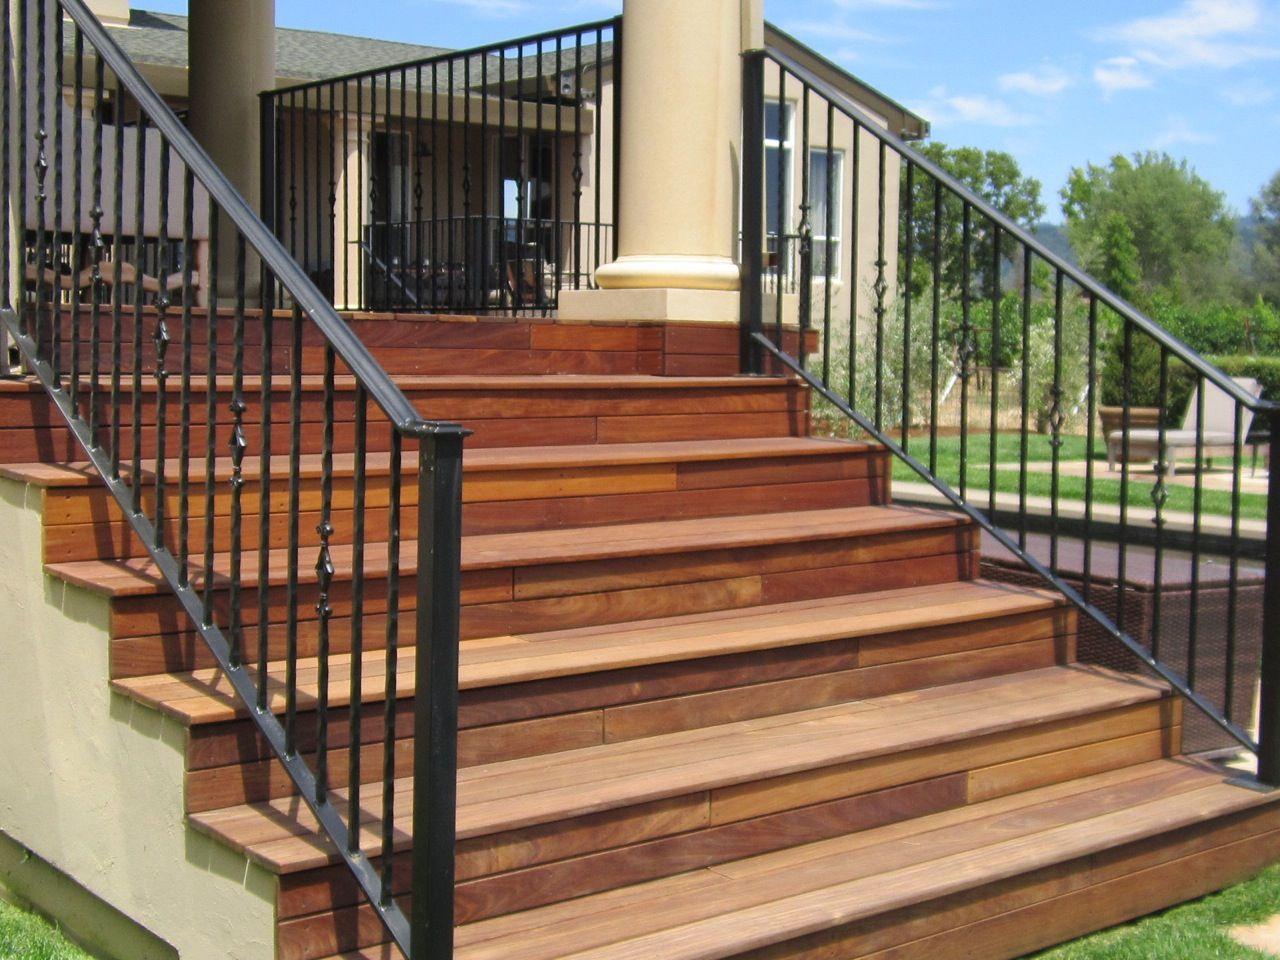 Best Custom Handrail For Stairs By Arbor Fence Inc Stair Handrail Handrail 400 x 300